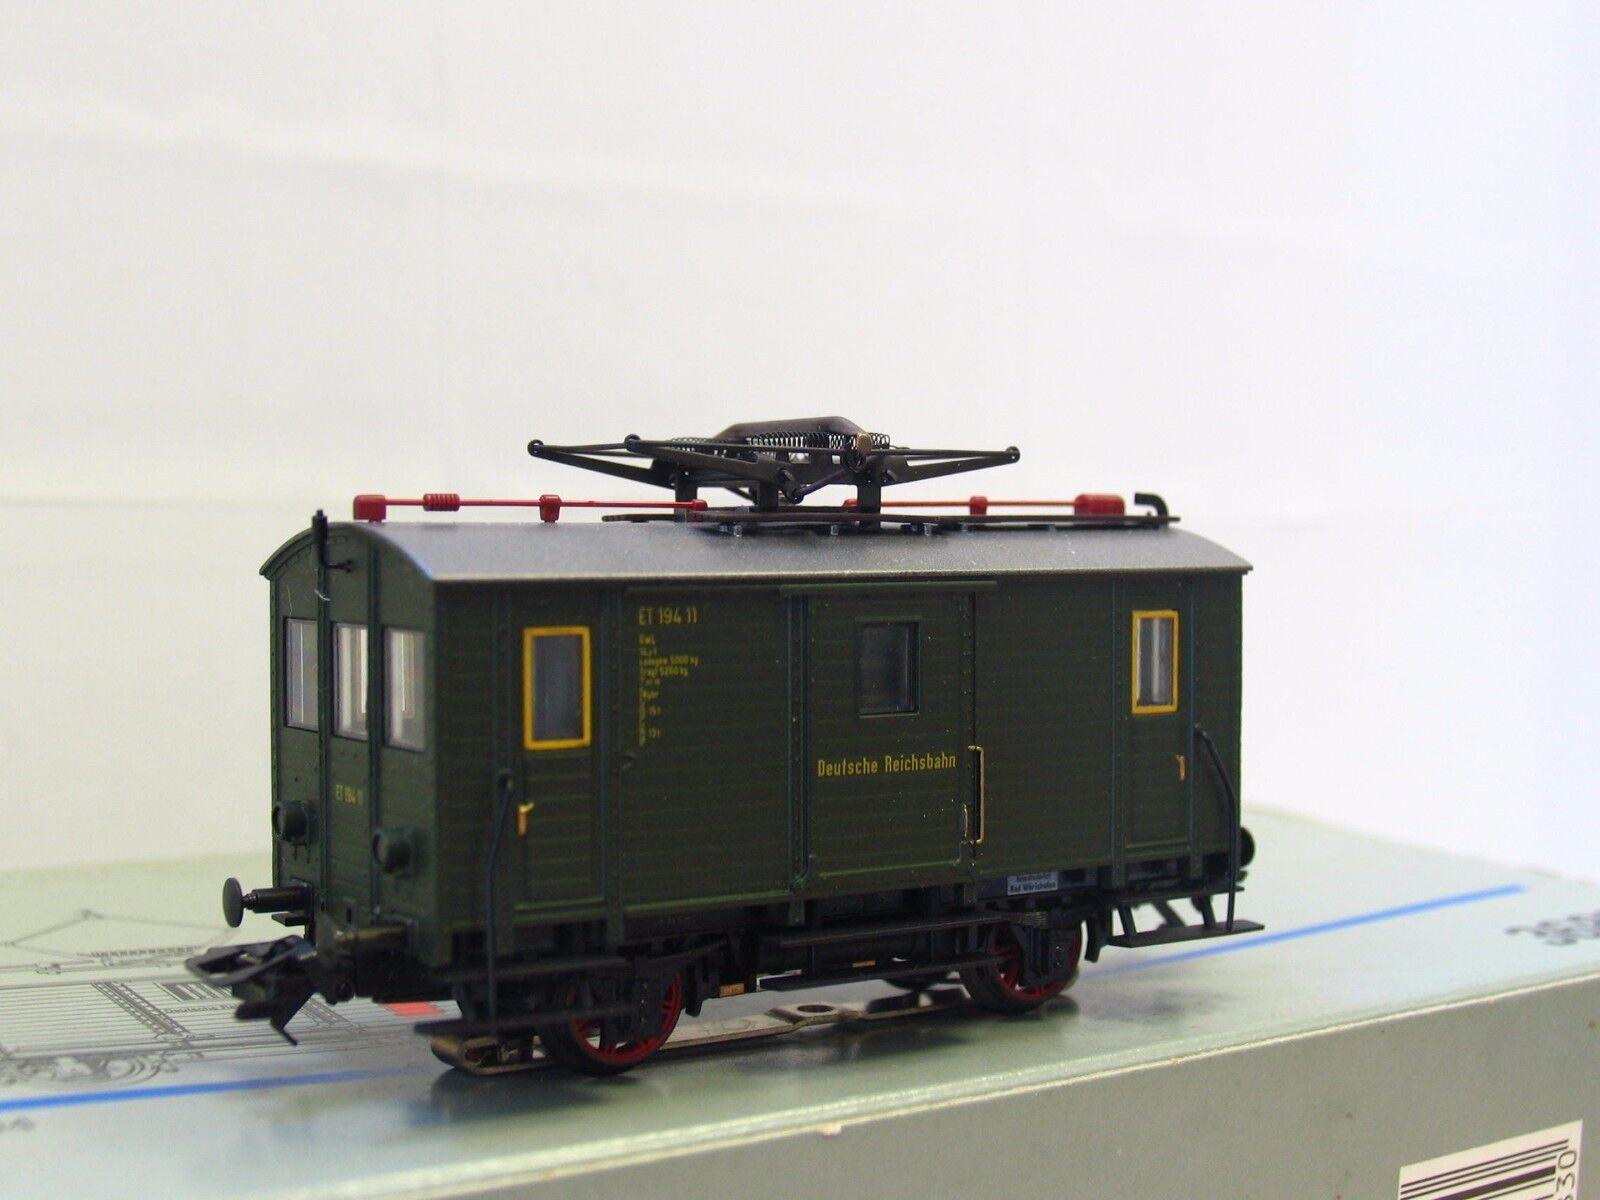 h0 3683 Borsaagli trainante carrello et 194 11 DRG Digital OVP  tr1214